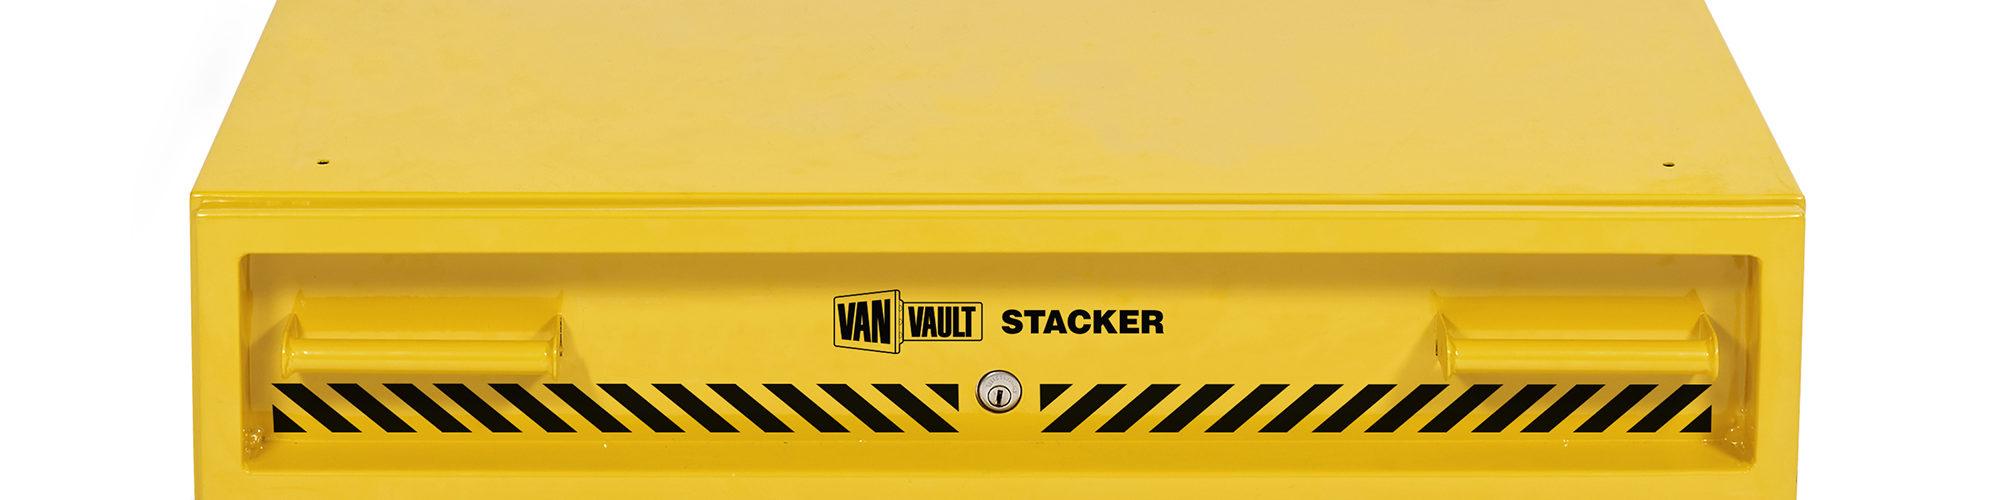 Yellow sheet steel Van Vault stacker drawer with steel grip handles and black Van Vault branding, on a white background